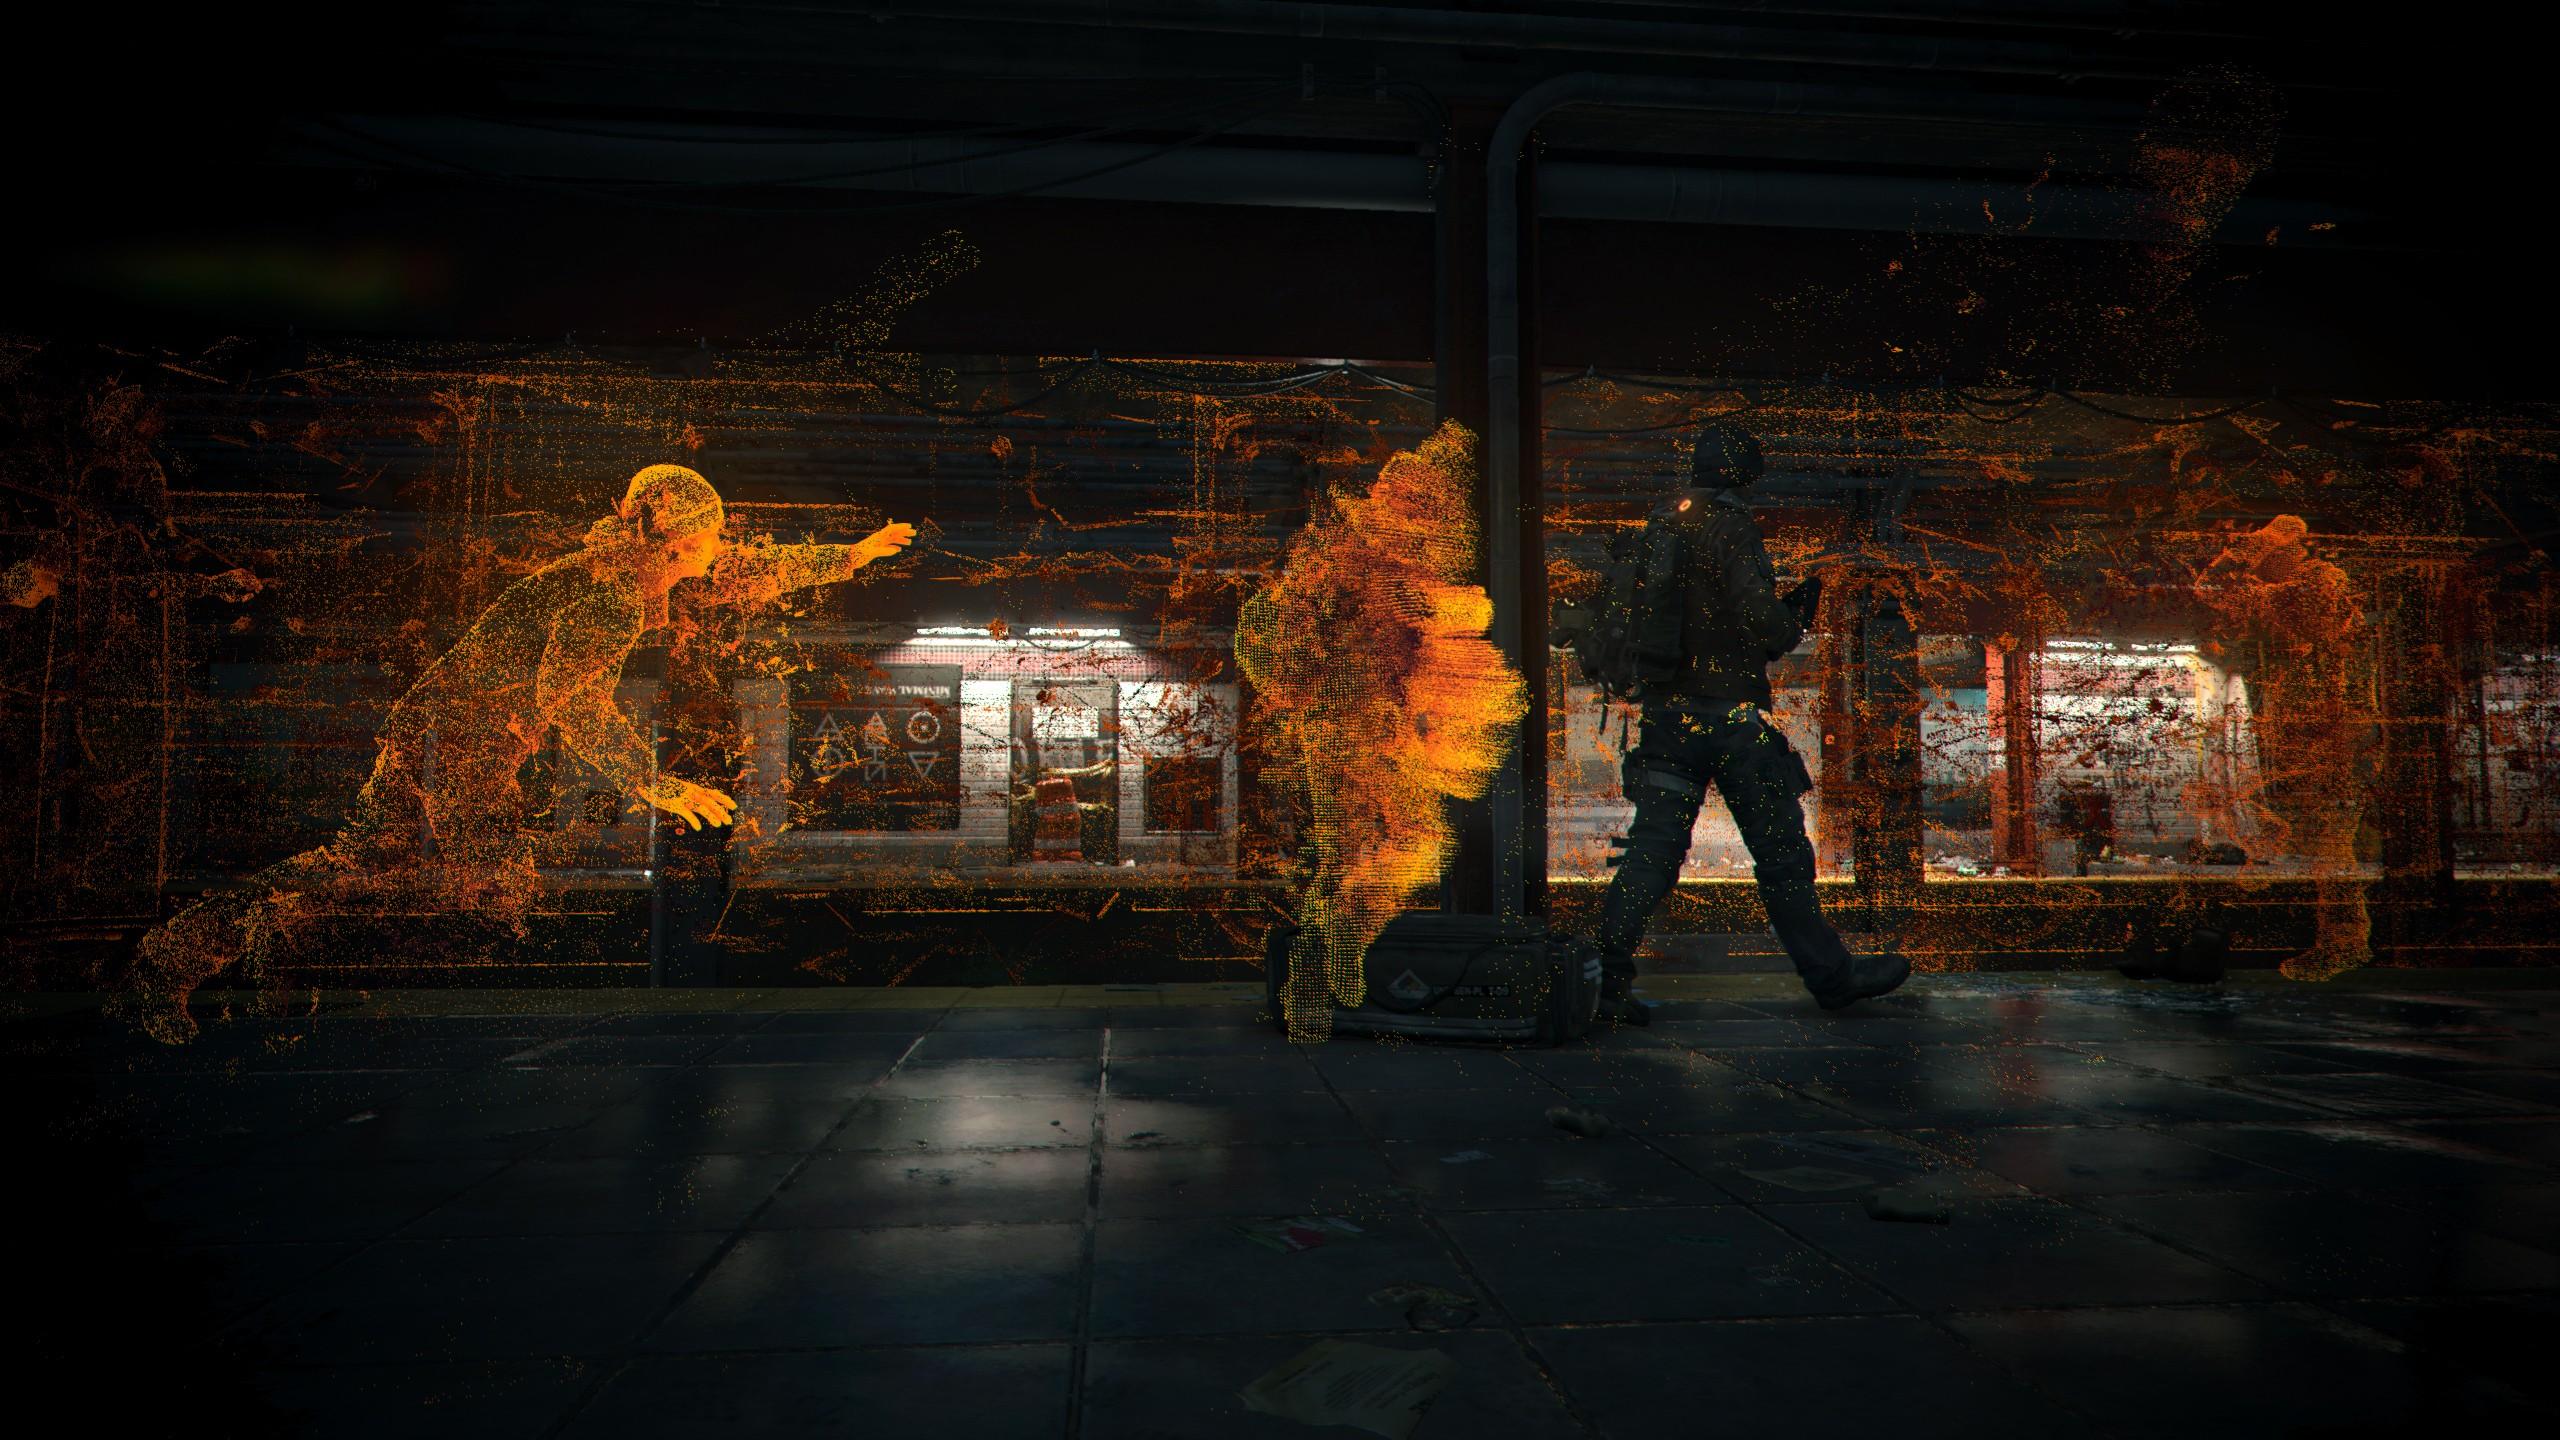 General 2560x1440 video games digital art glitch art subway